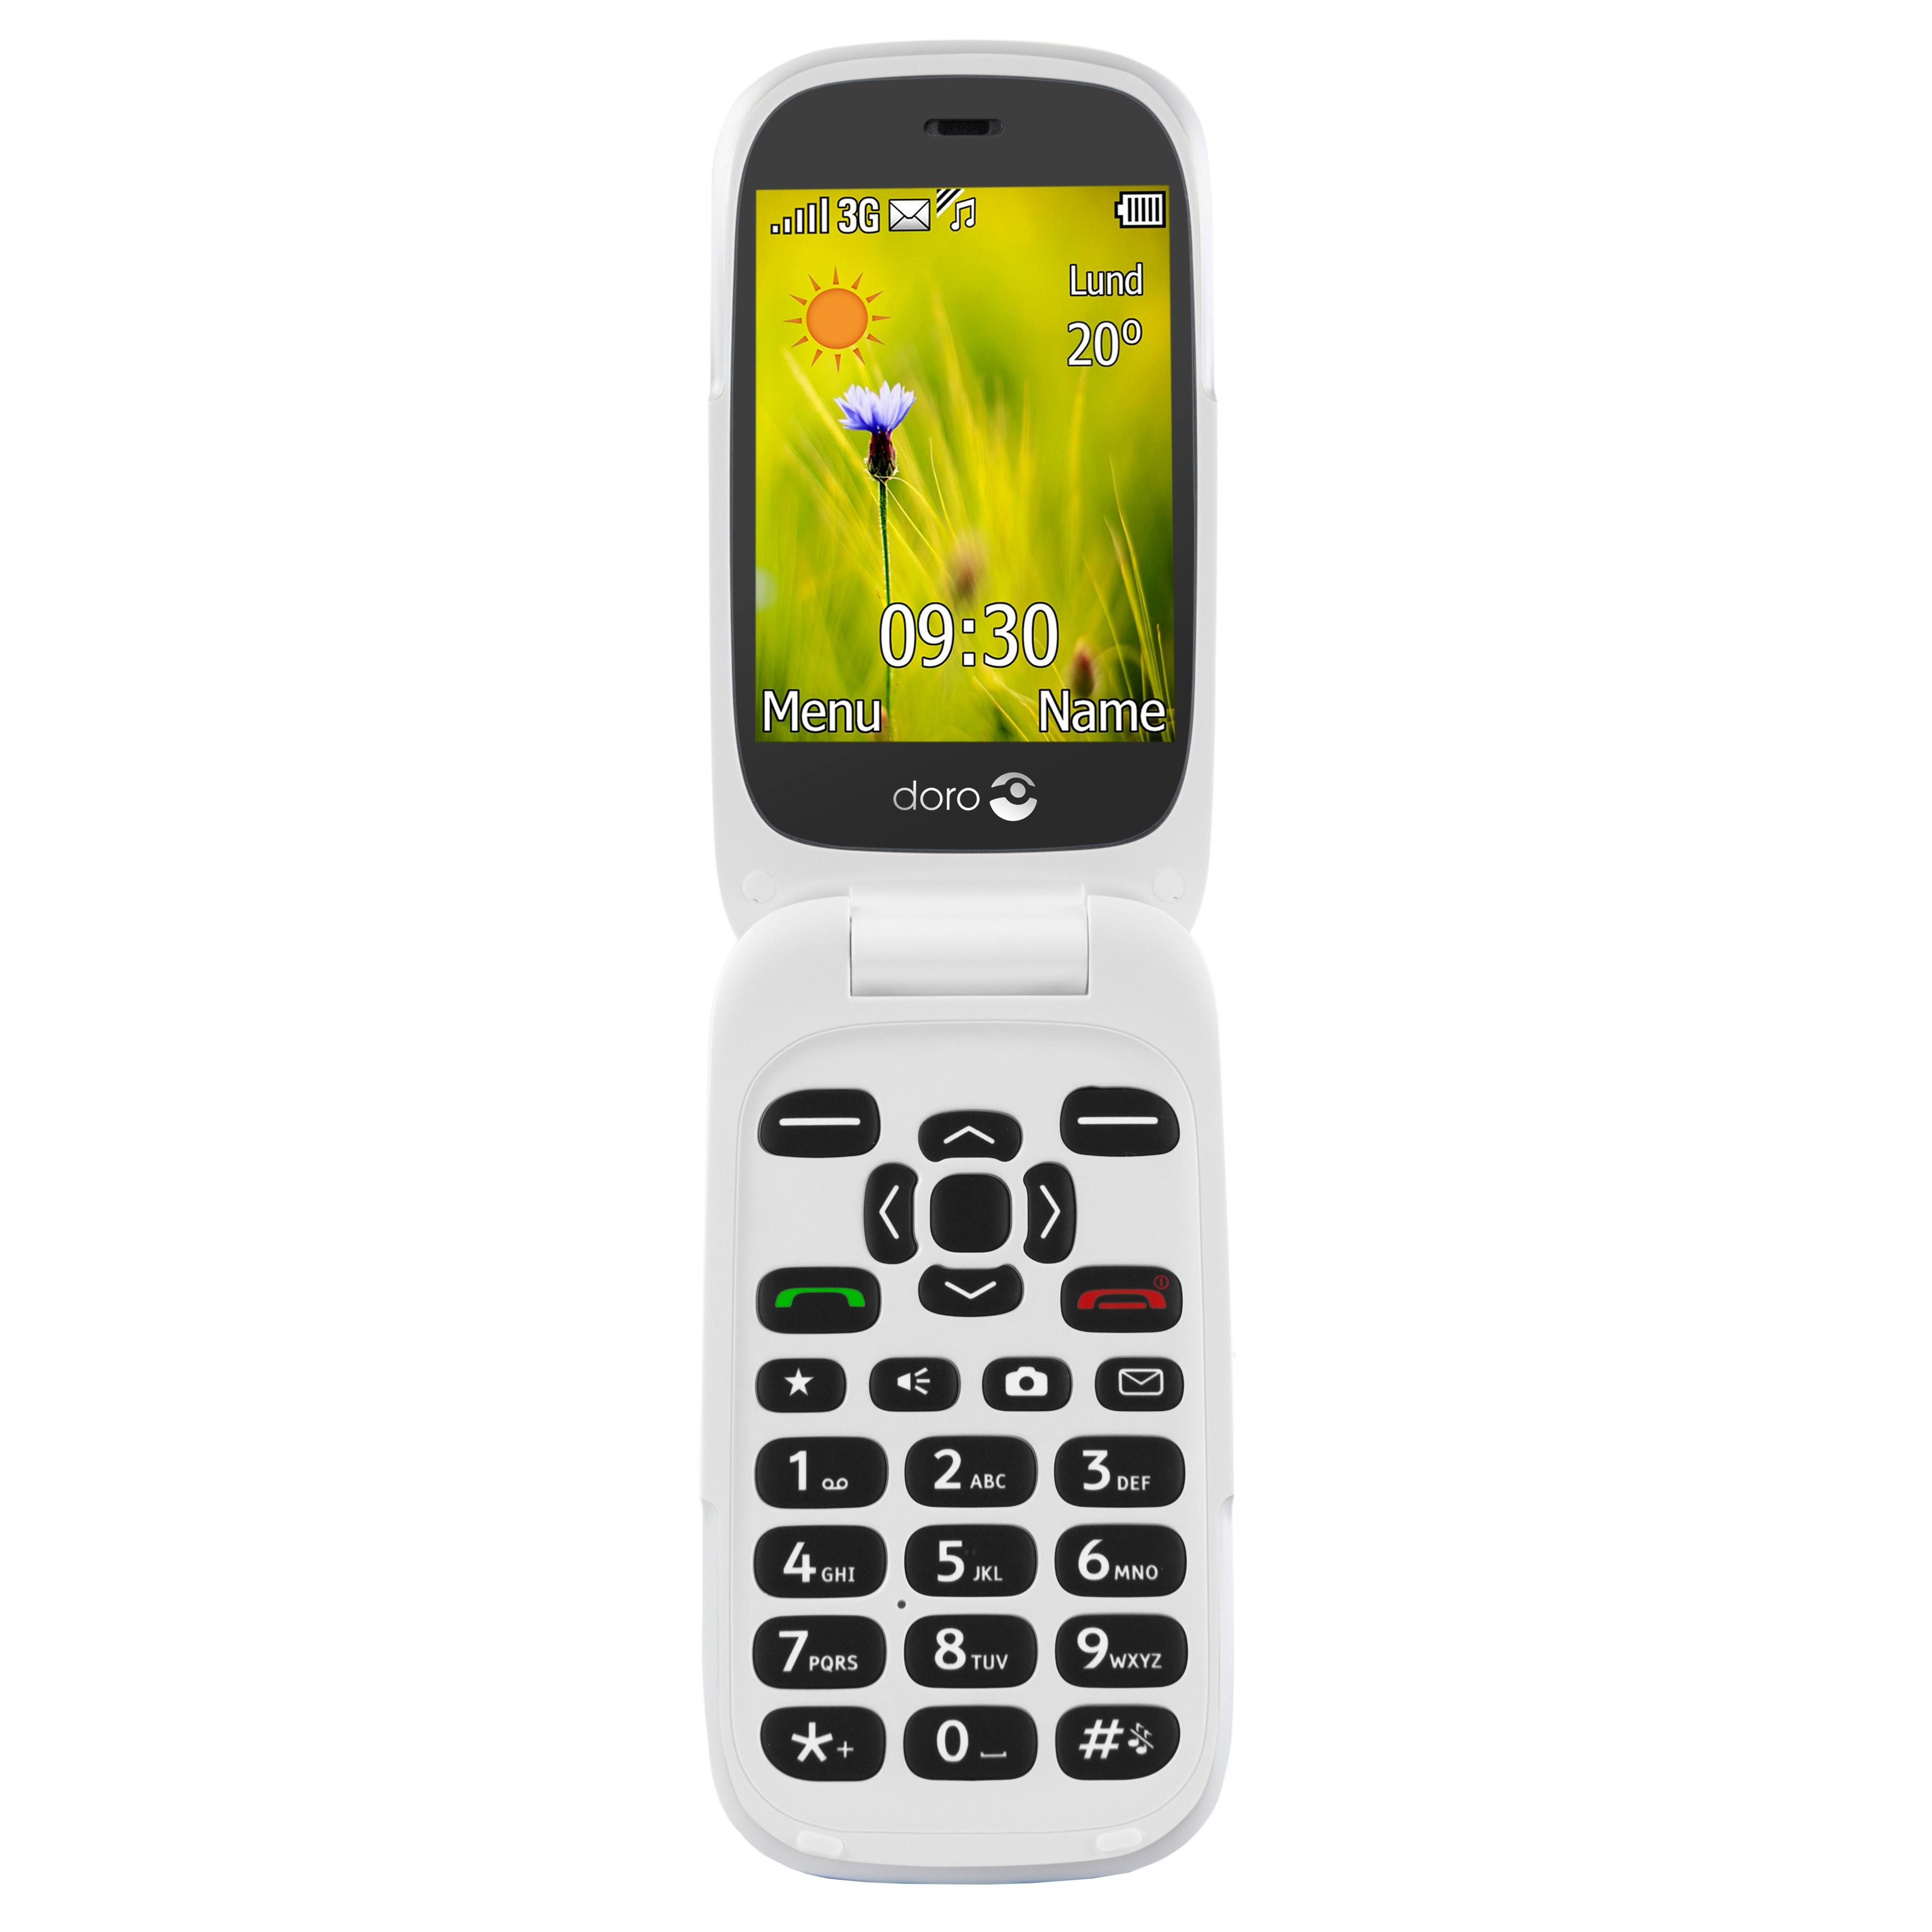 mobiltelefon best i test sextreff østfold